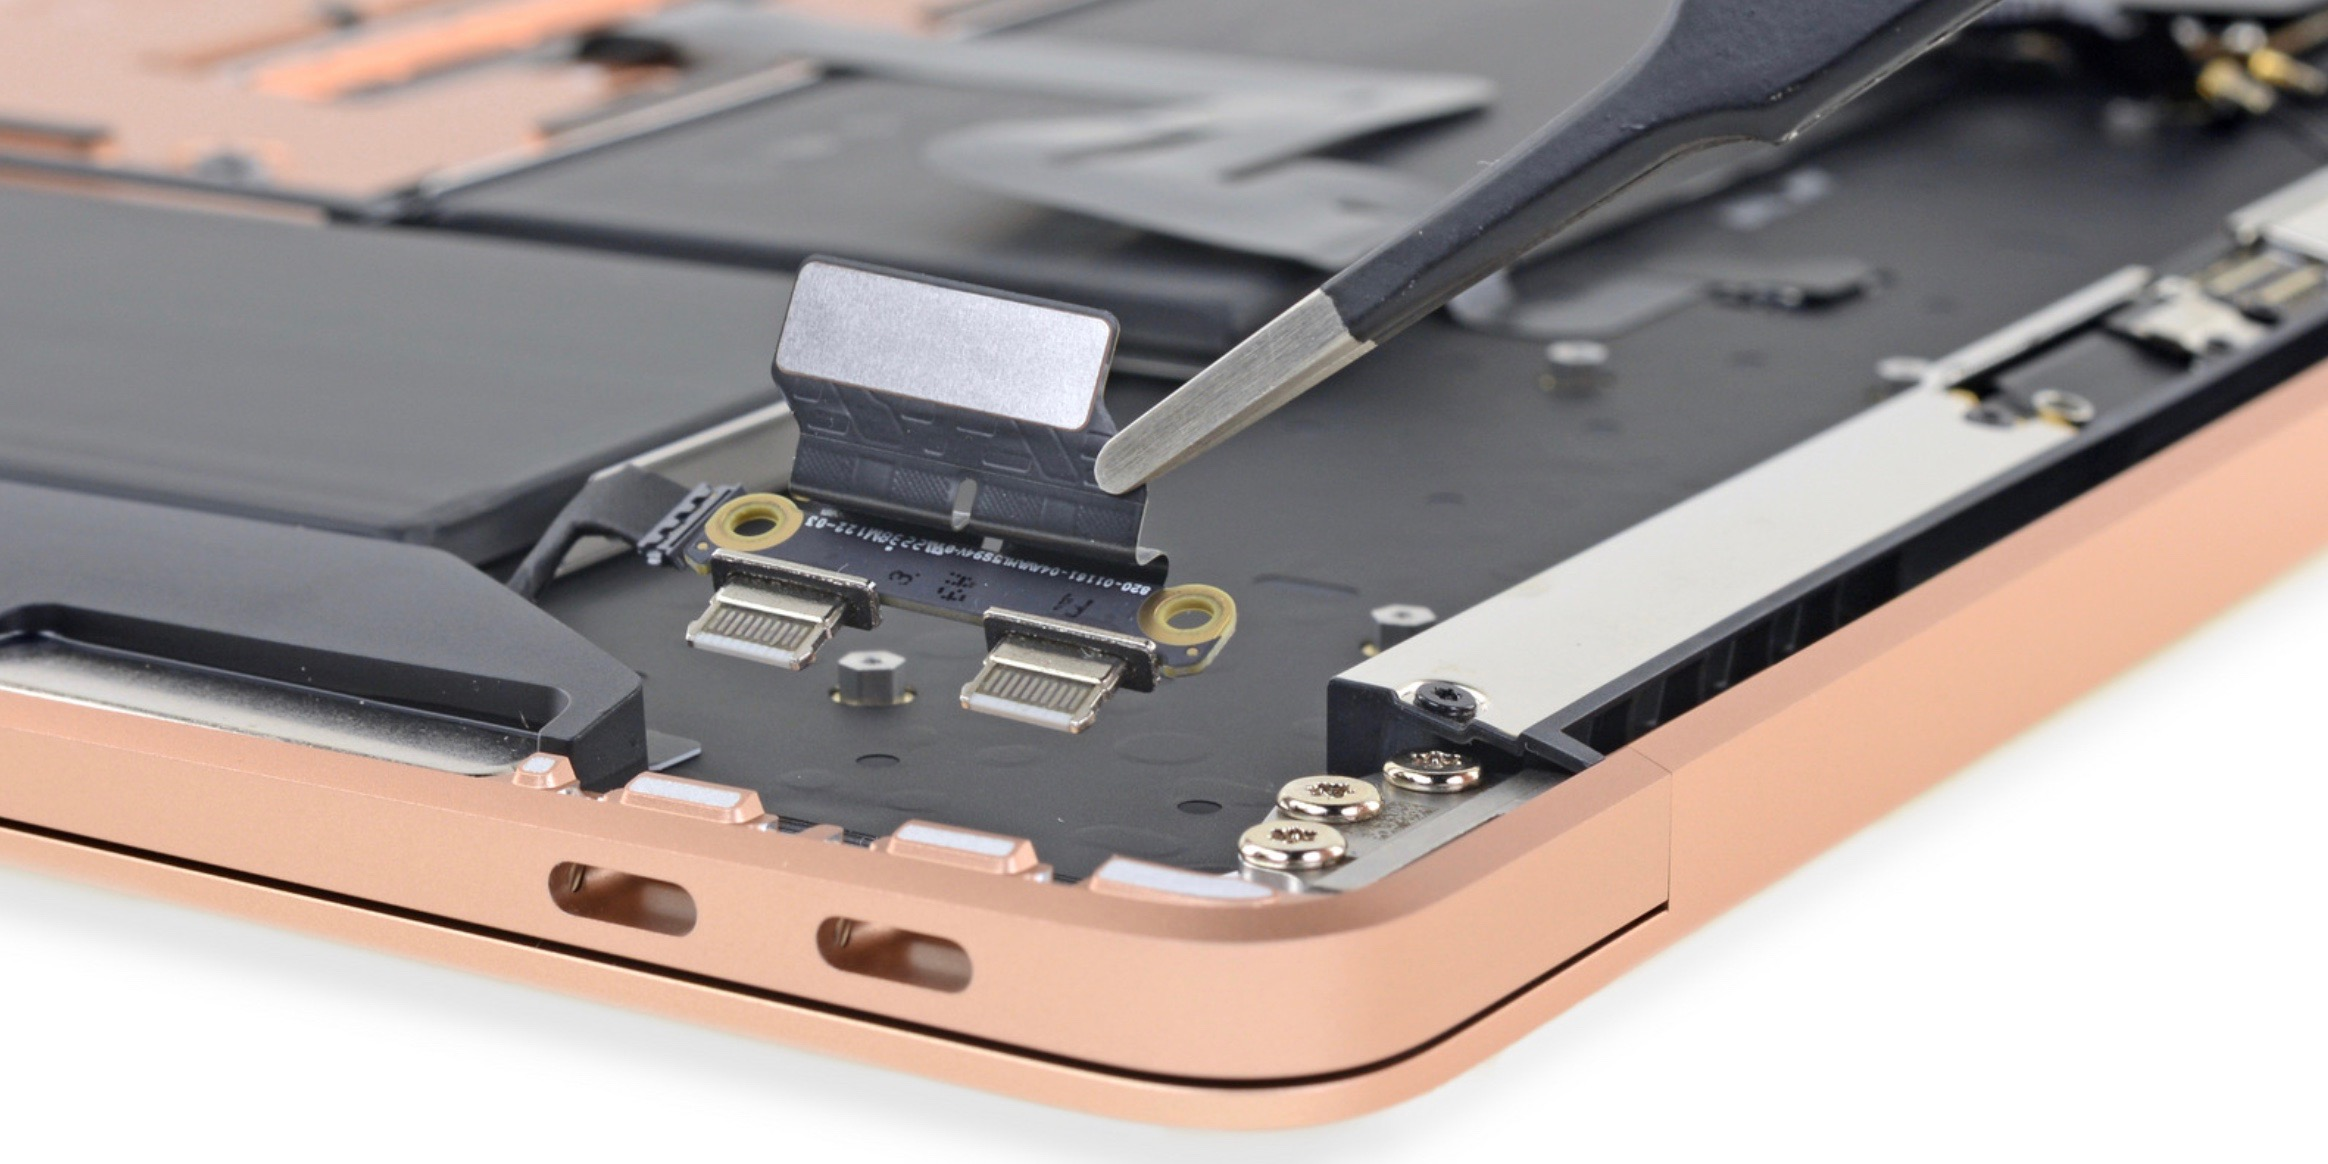 iFixit Retina MacBook Air teardown earns better repairability scores than MacBook Pro and MacBook